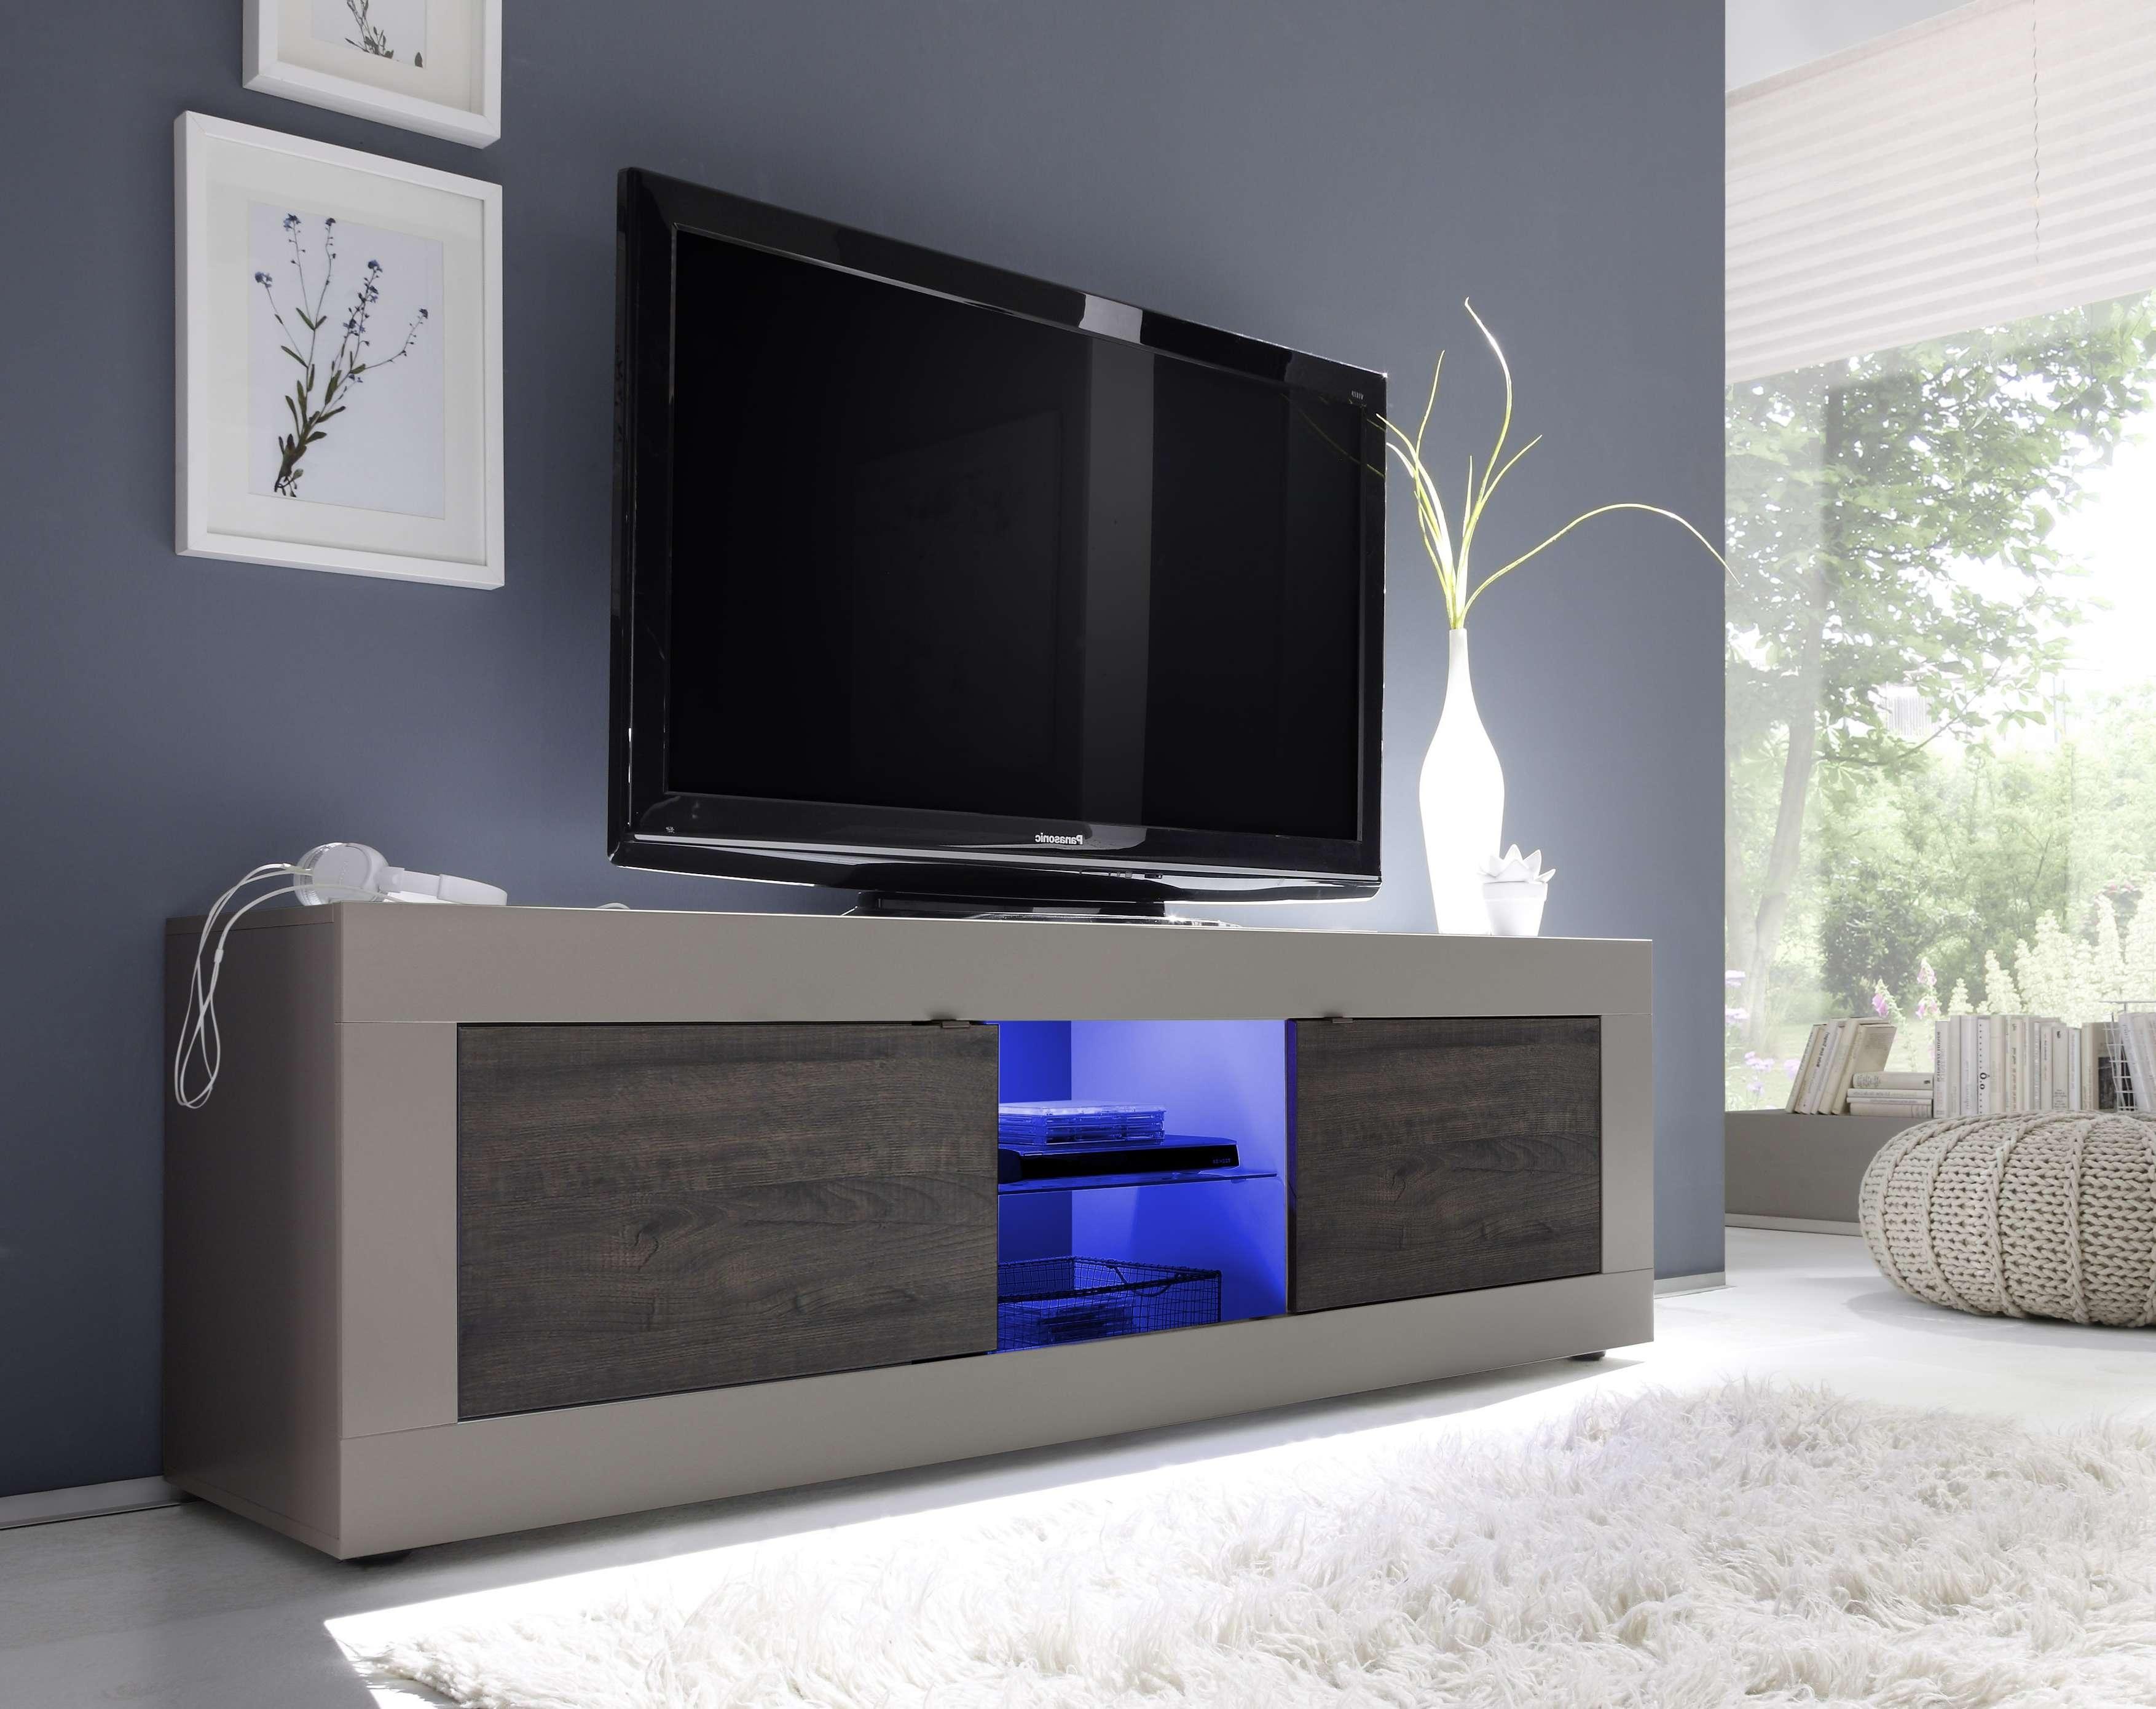 Basic Big Tv Stand, Beige + Wenge Buy Online At Best Price – Sohomod Inside Wenge Tv Cabinets (View 11 of 20)